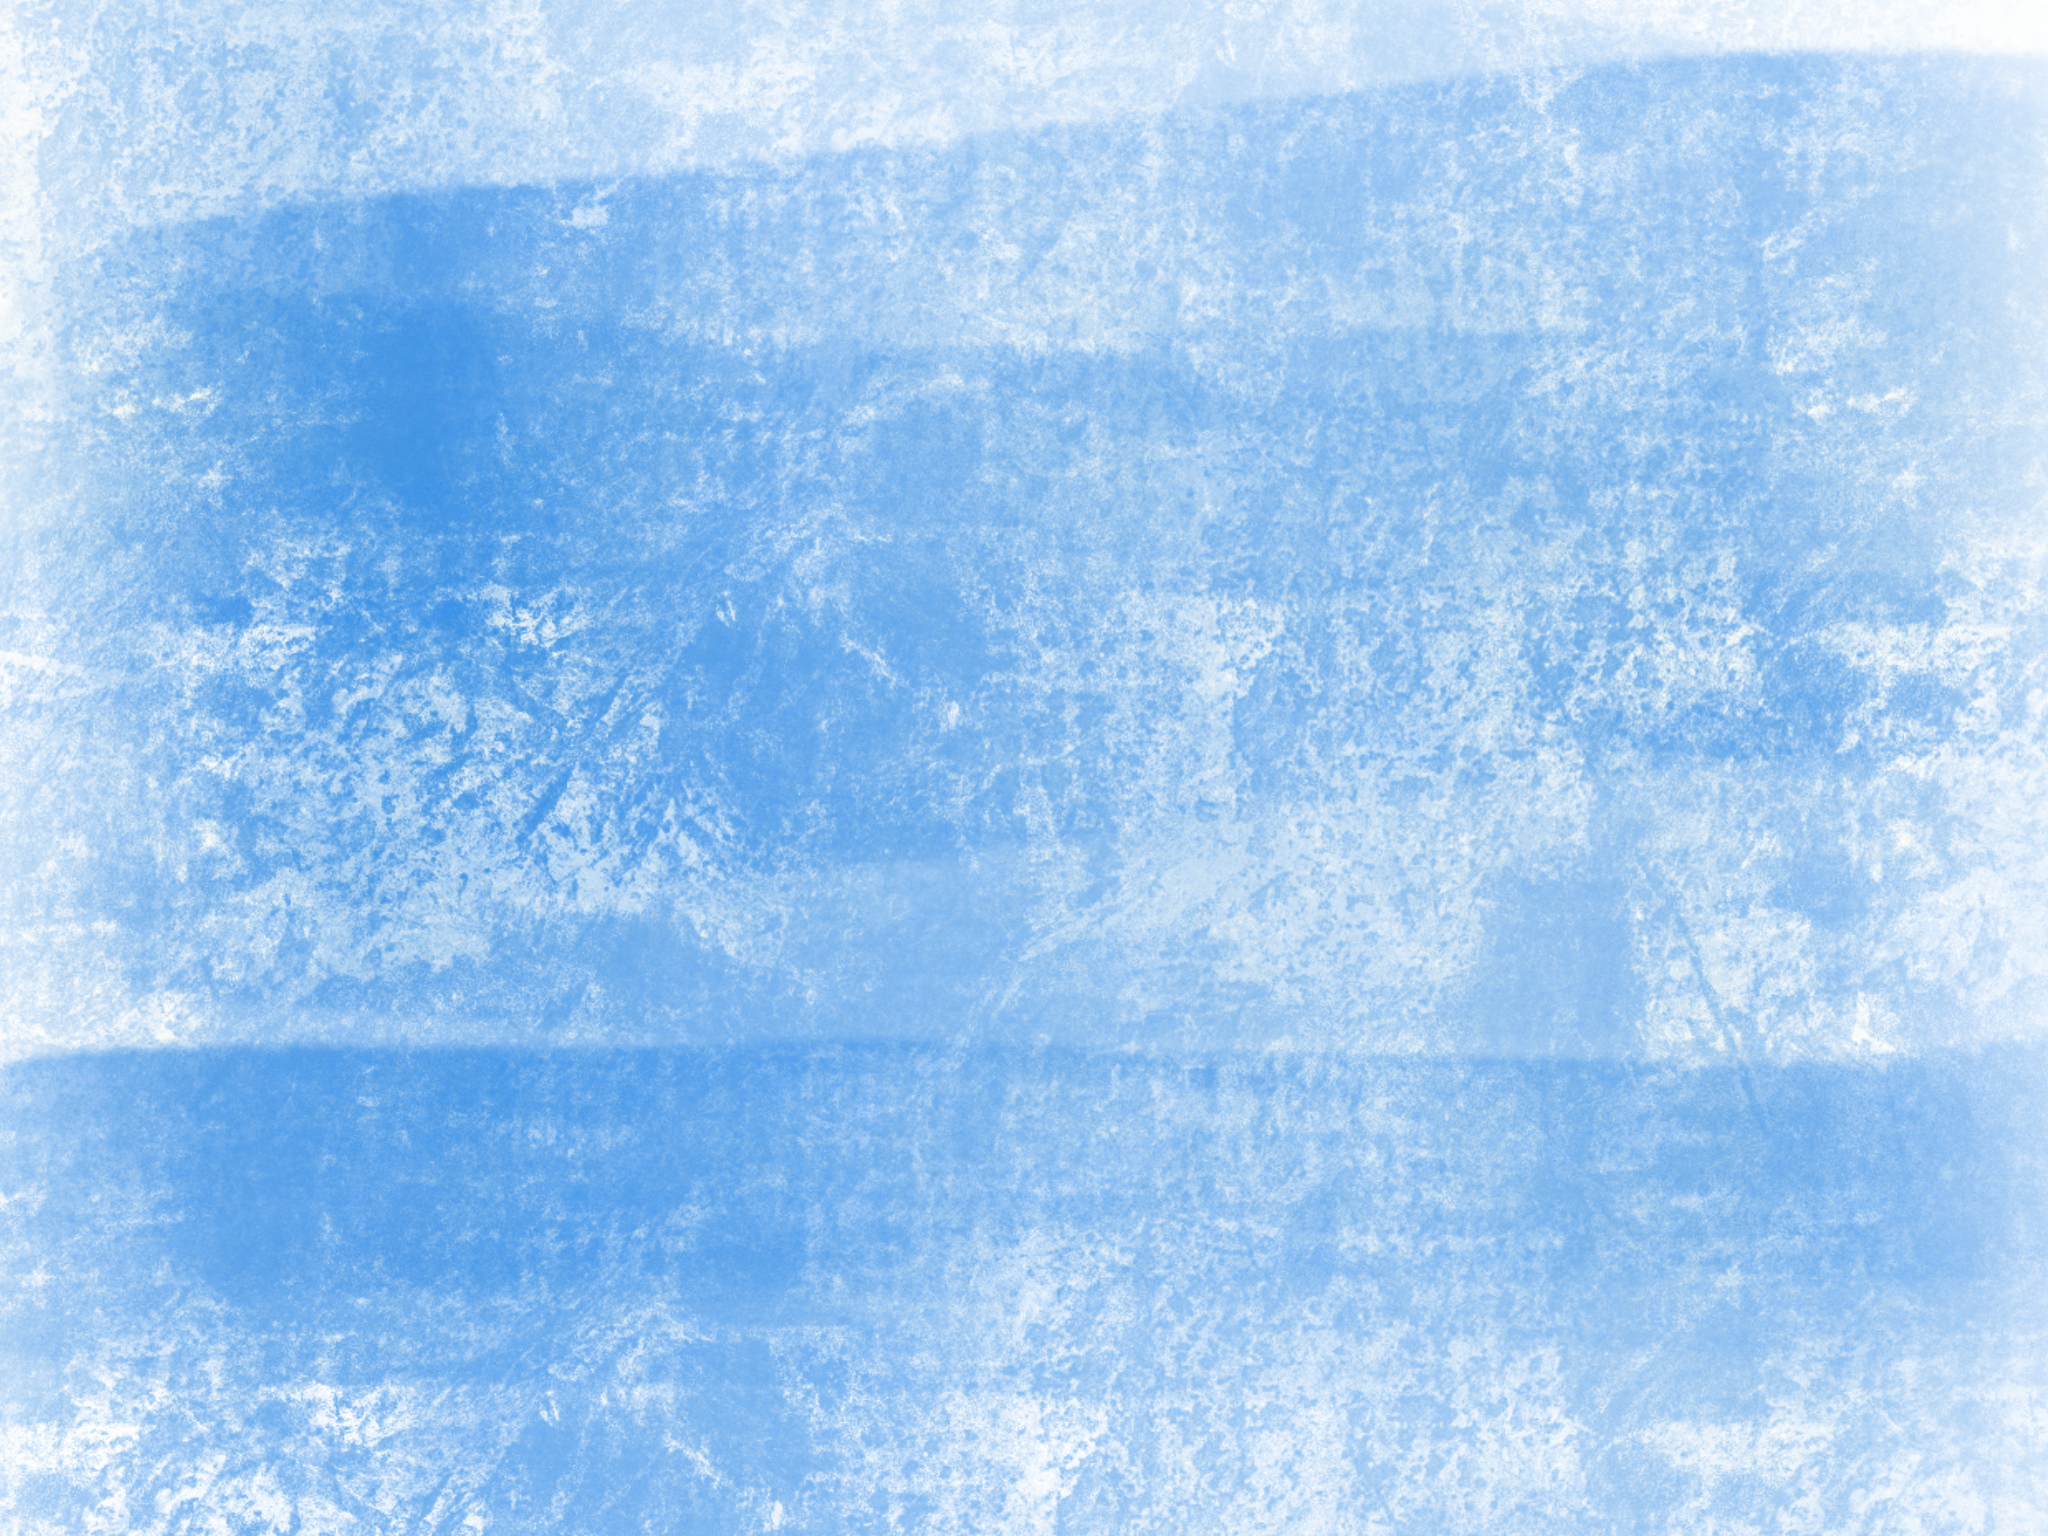 my default present is blue.